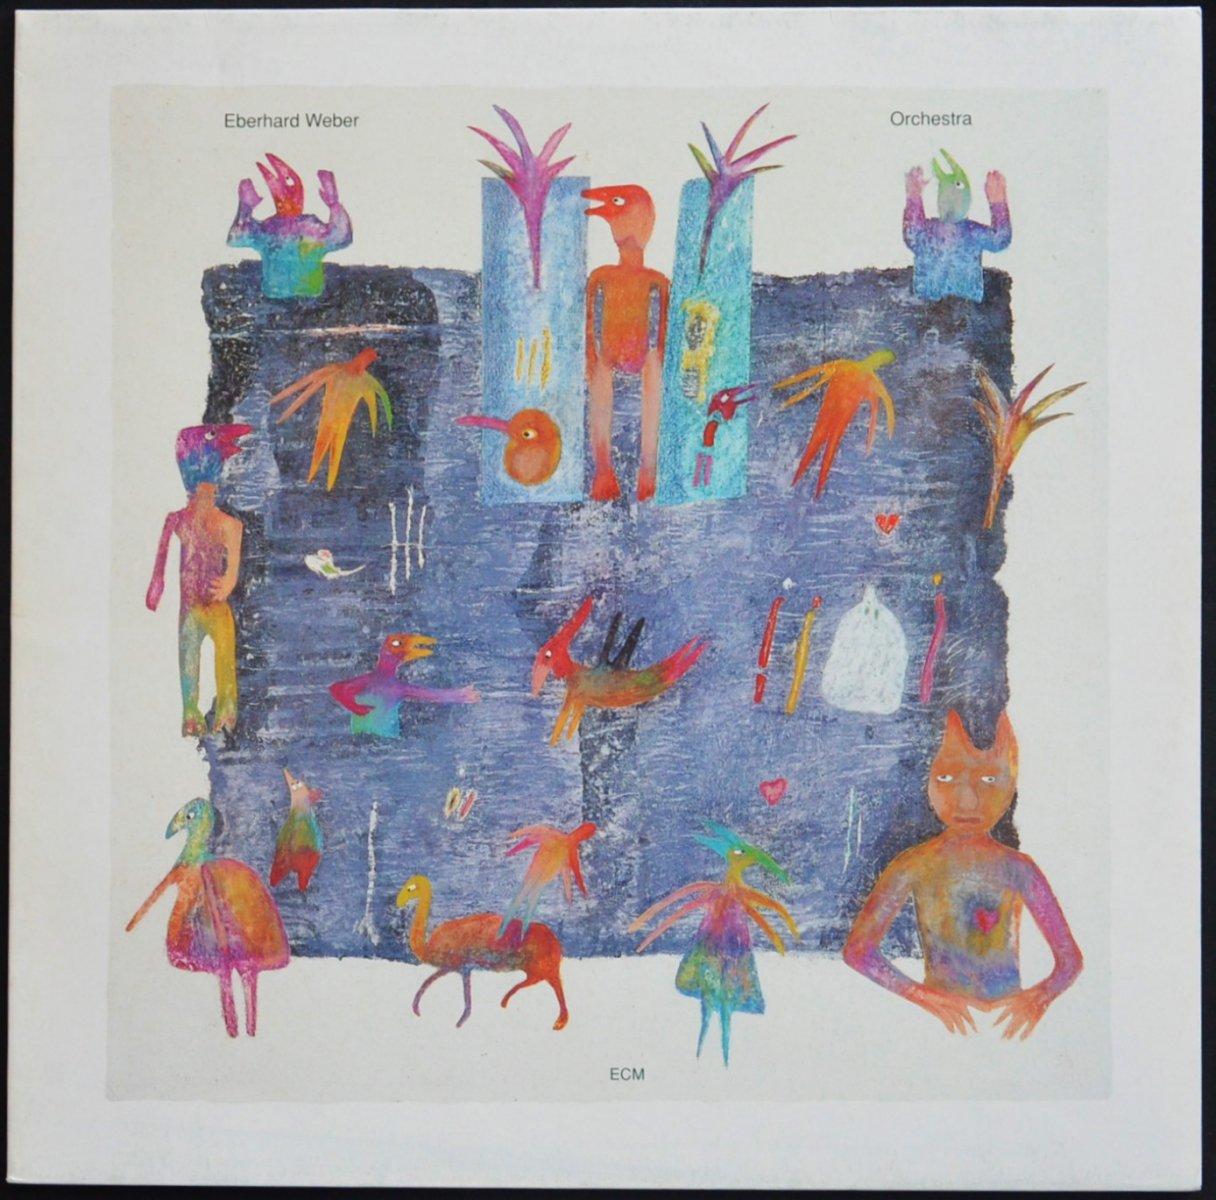 EBERHARD WEBER / ORCHESTRA (LP)